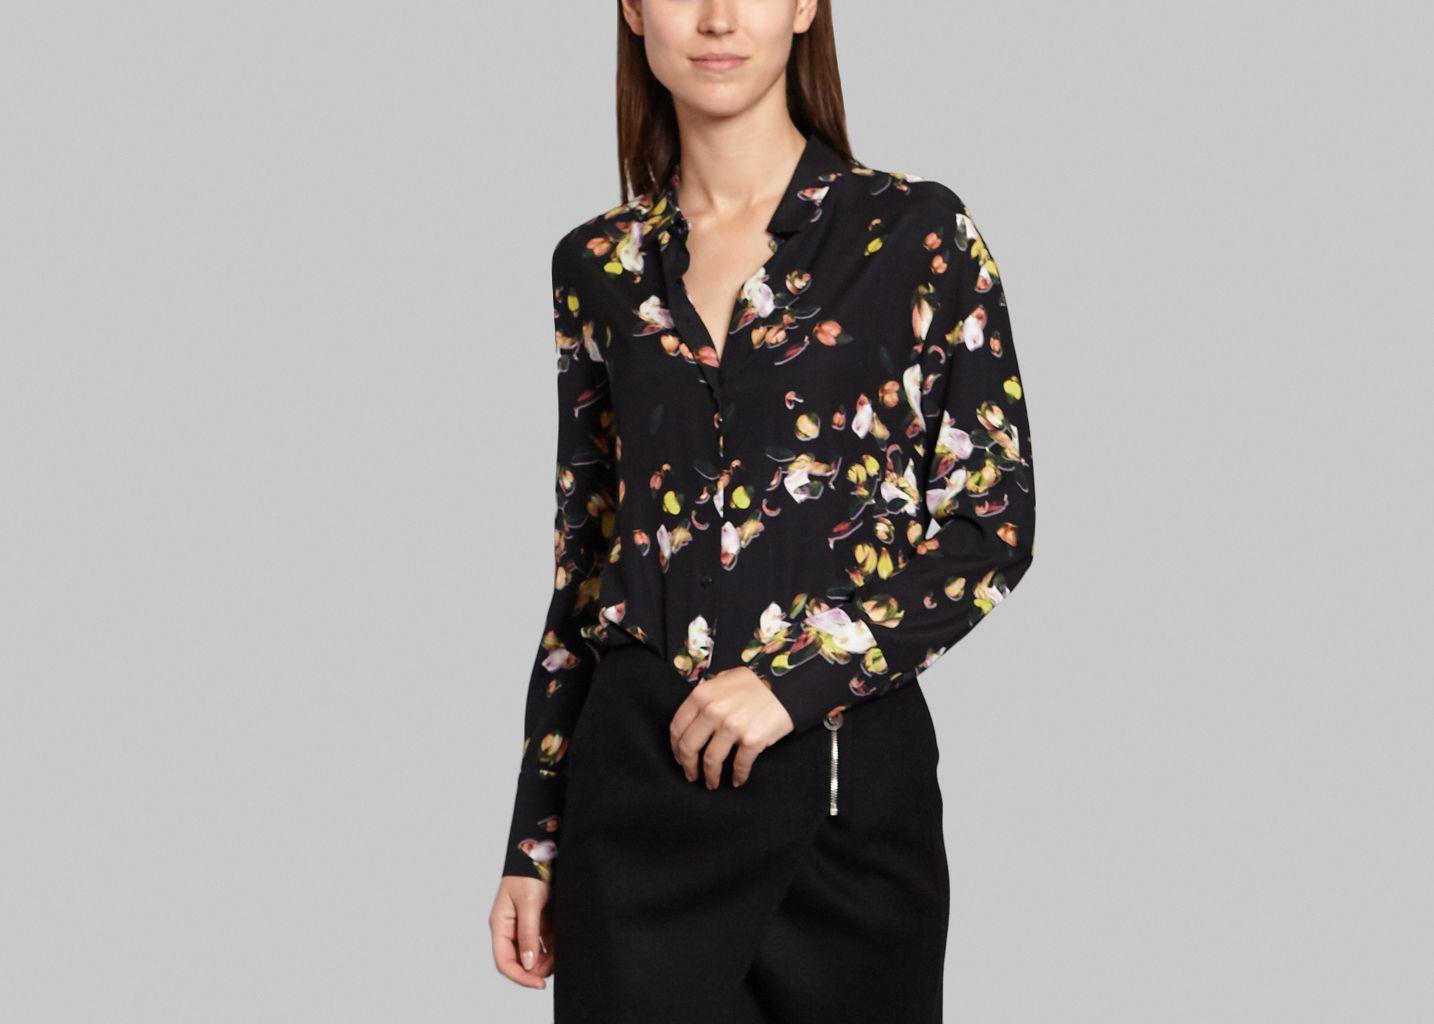 Aurore Floral Printed Shirt - Cacharel